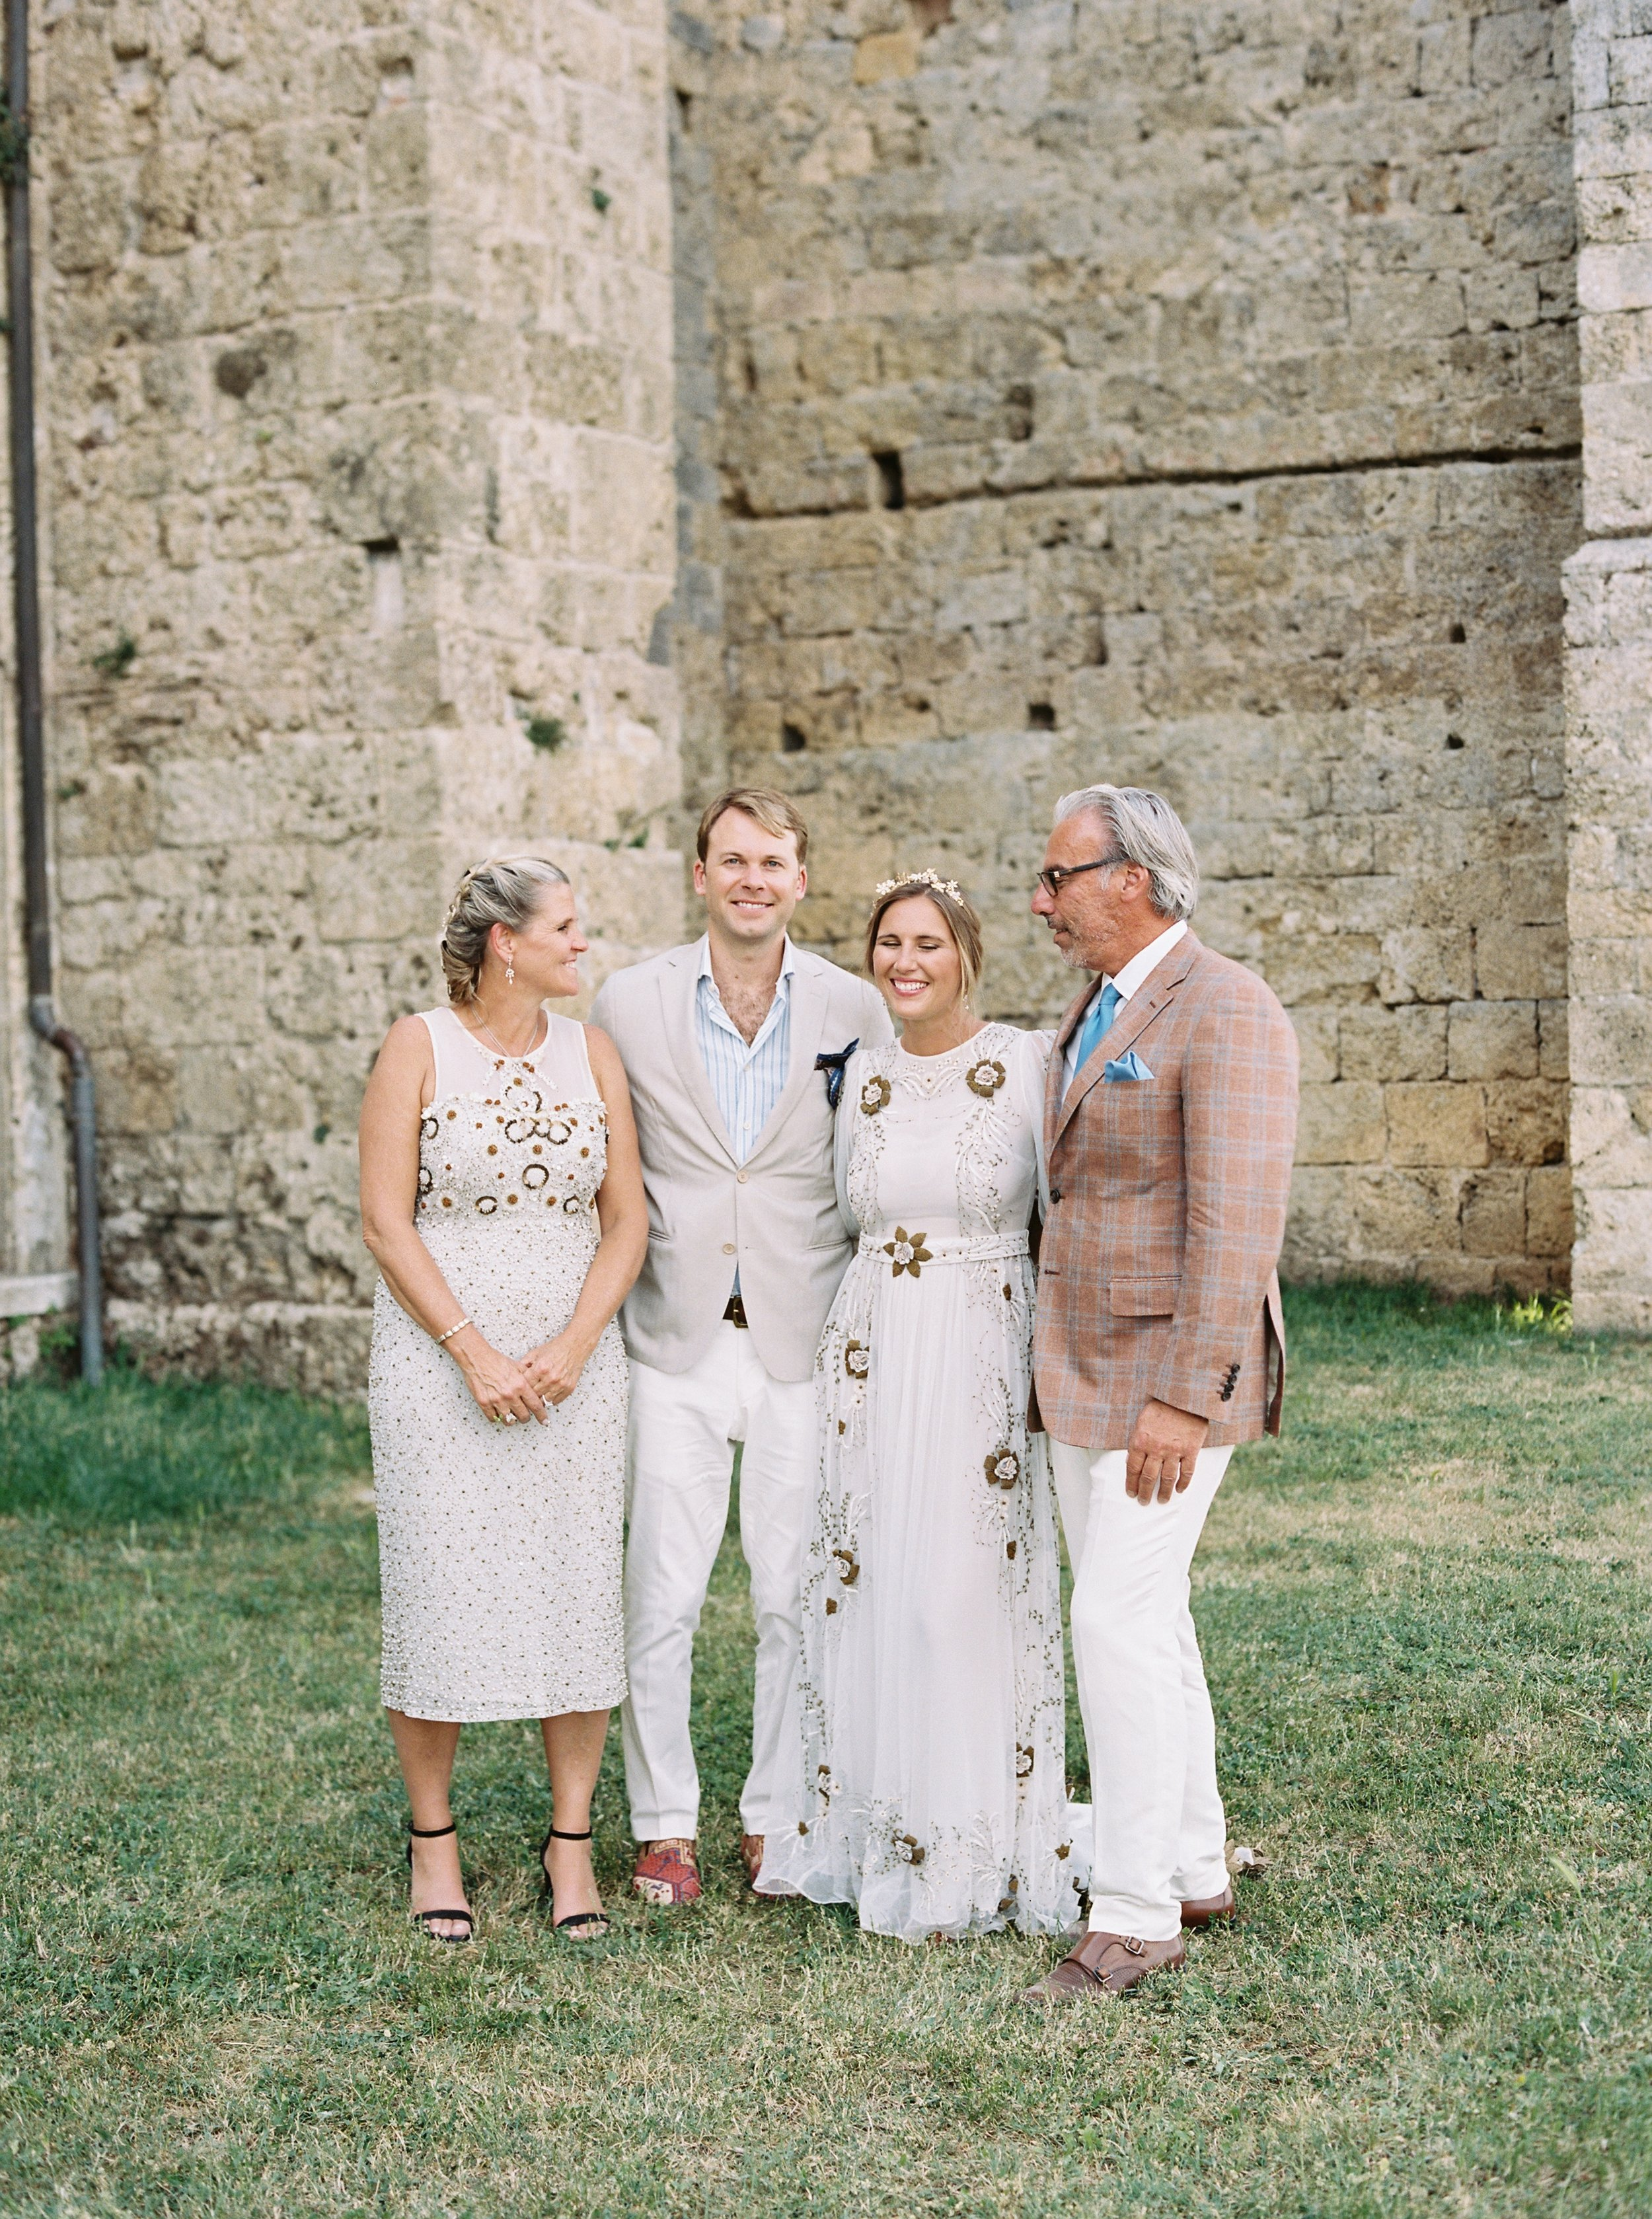 Kyle John l Fine Art Wedding Photography l Chicago, Copenhagen, California, New York, Destination l Blog l Alexis and Zach_Borgo Santo Pietro_Italy_Tuscany_51